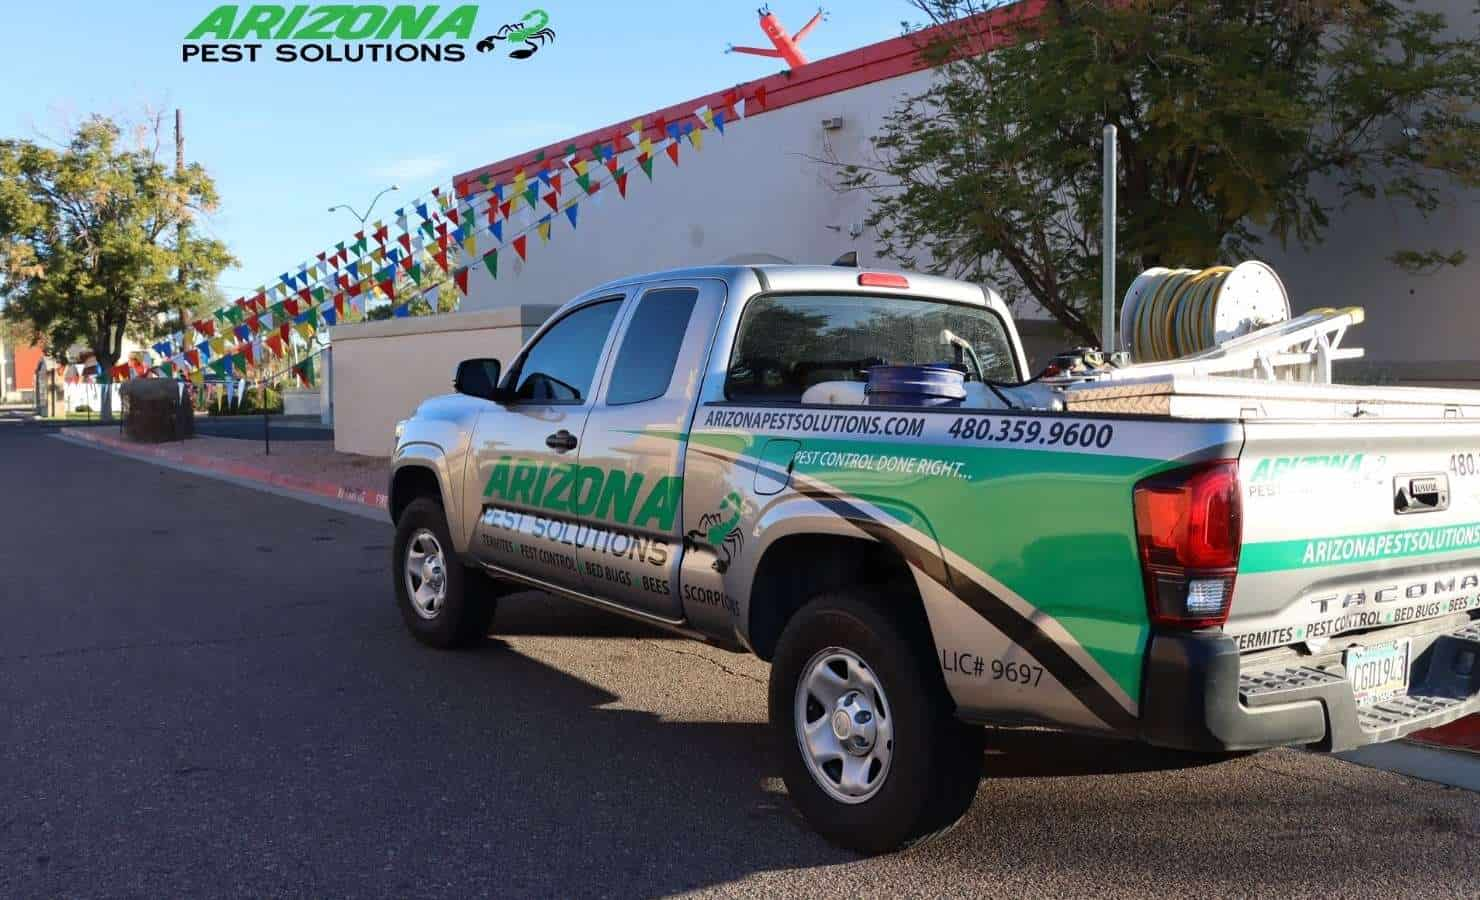 commercial pest control services - arizona pest solutions gilbert az